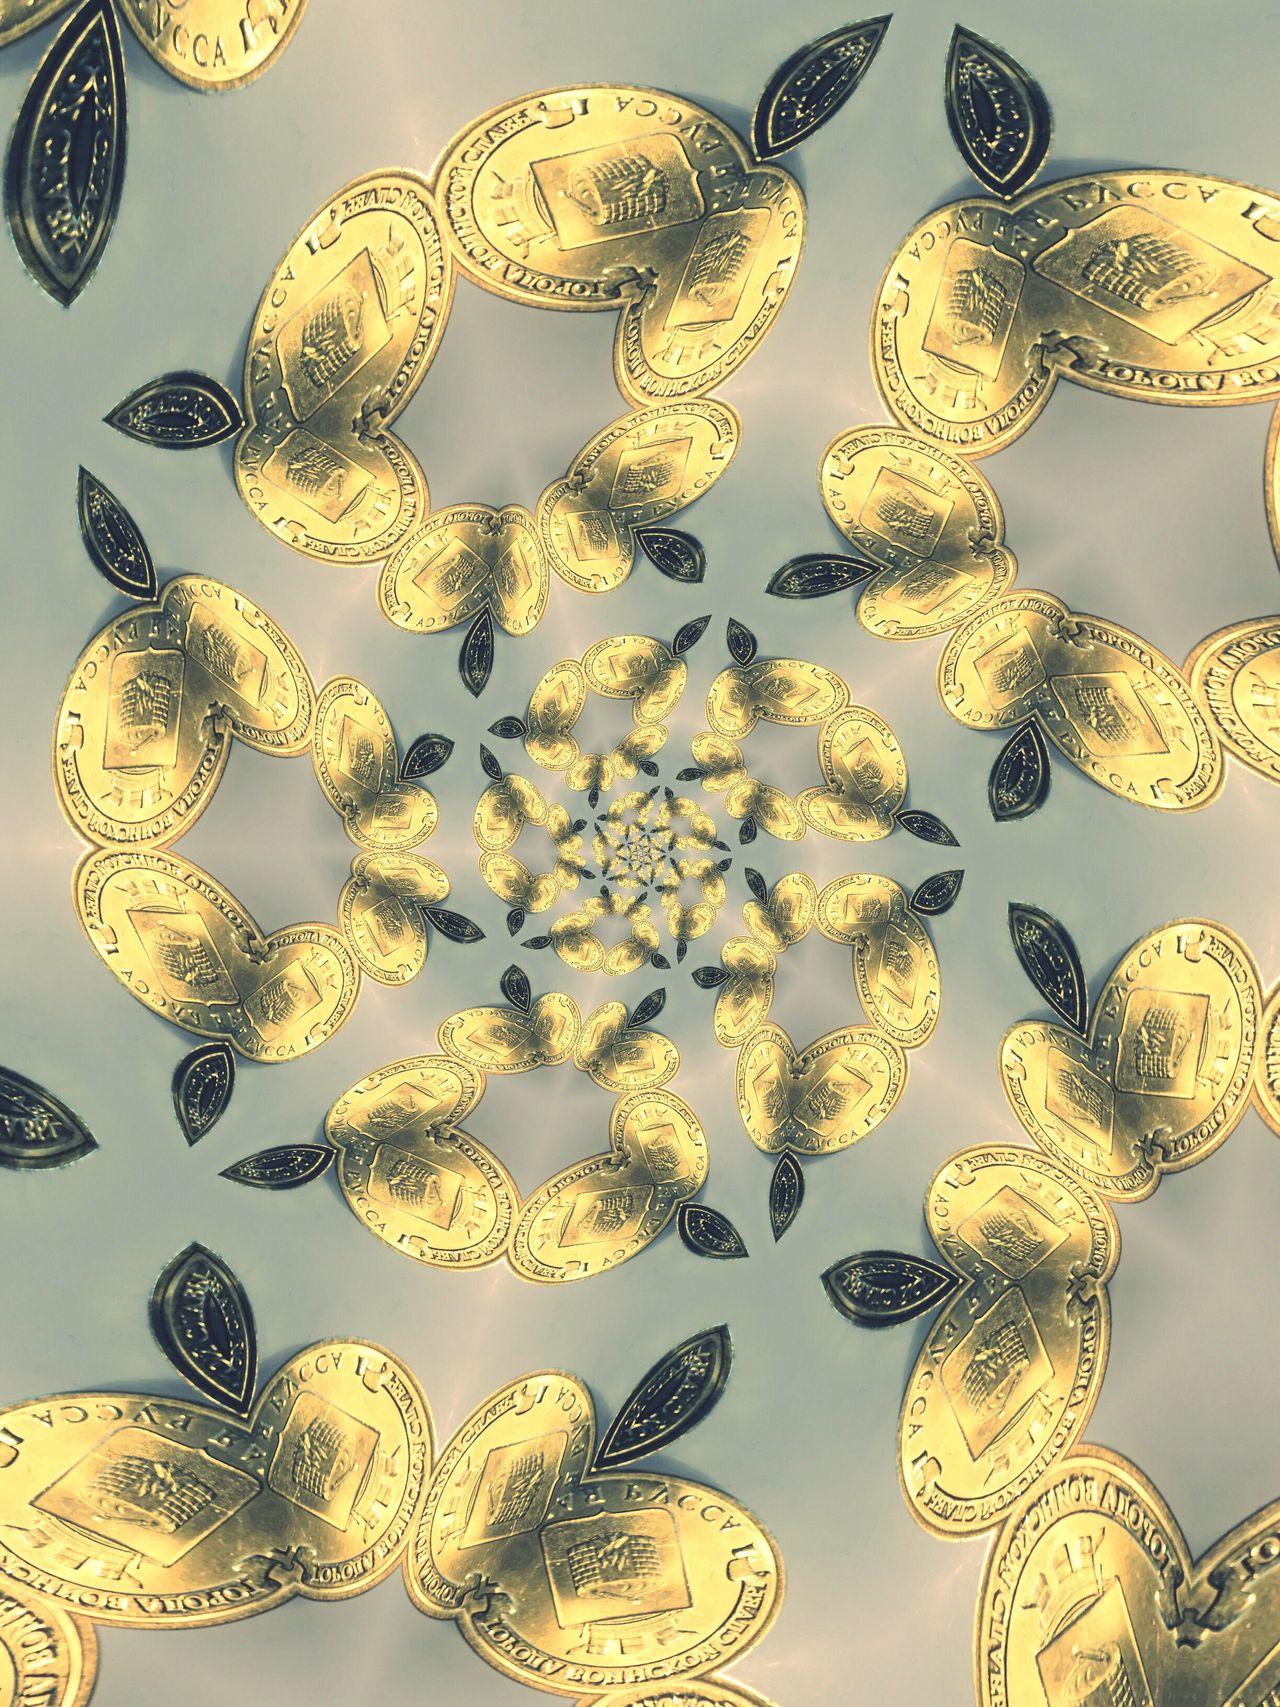 Россыпь монет...Калейдоскоп.Психоделика. Gold Colored Abstract артфото финансы Adapted To The City